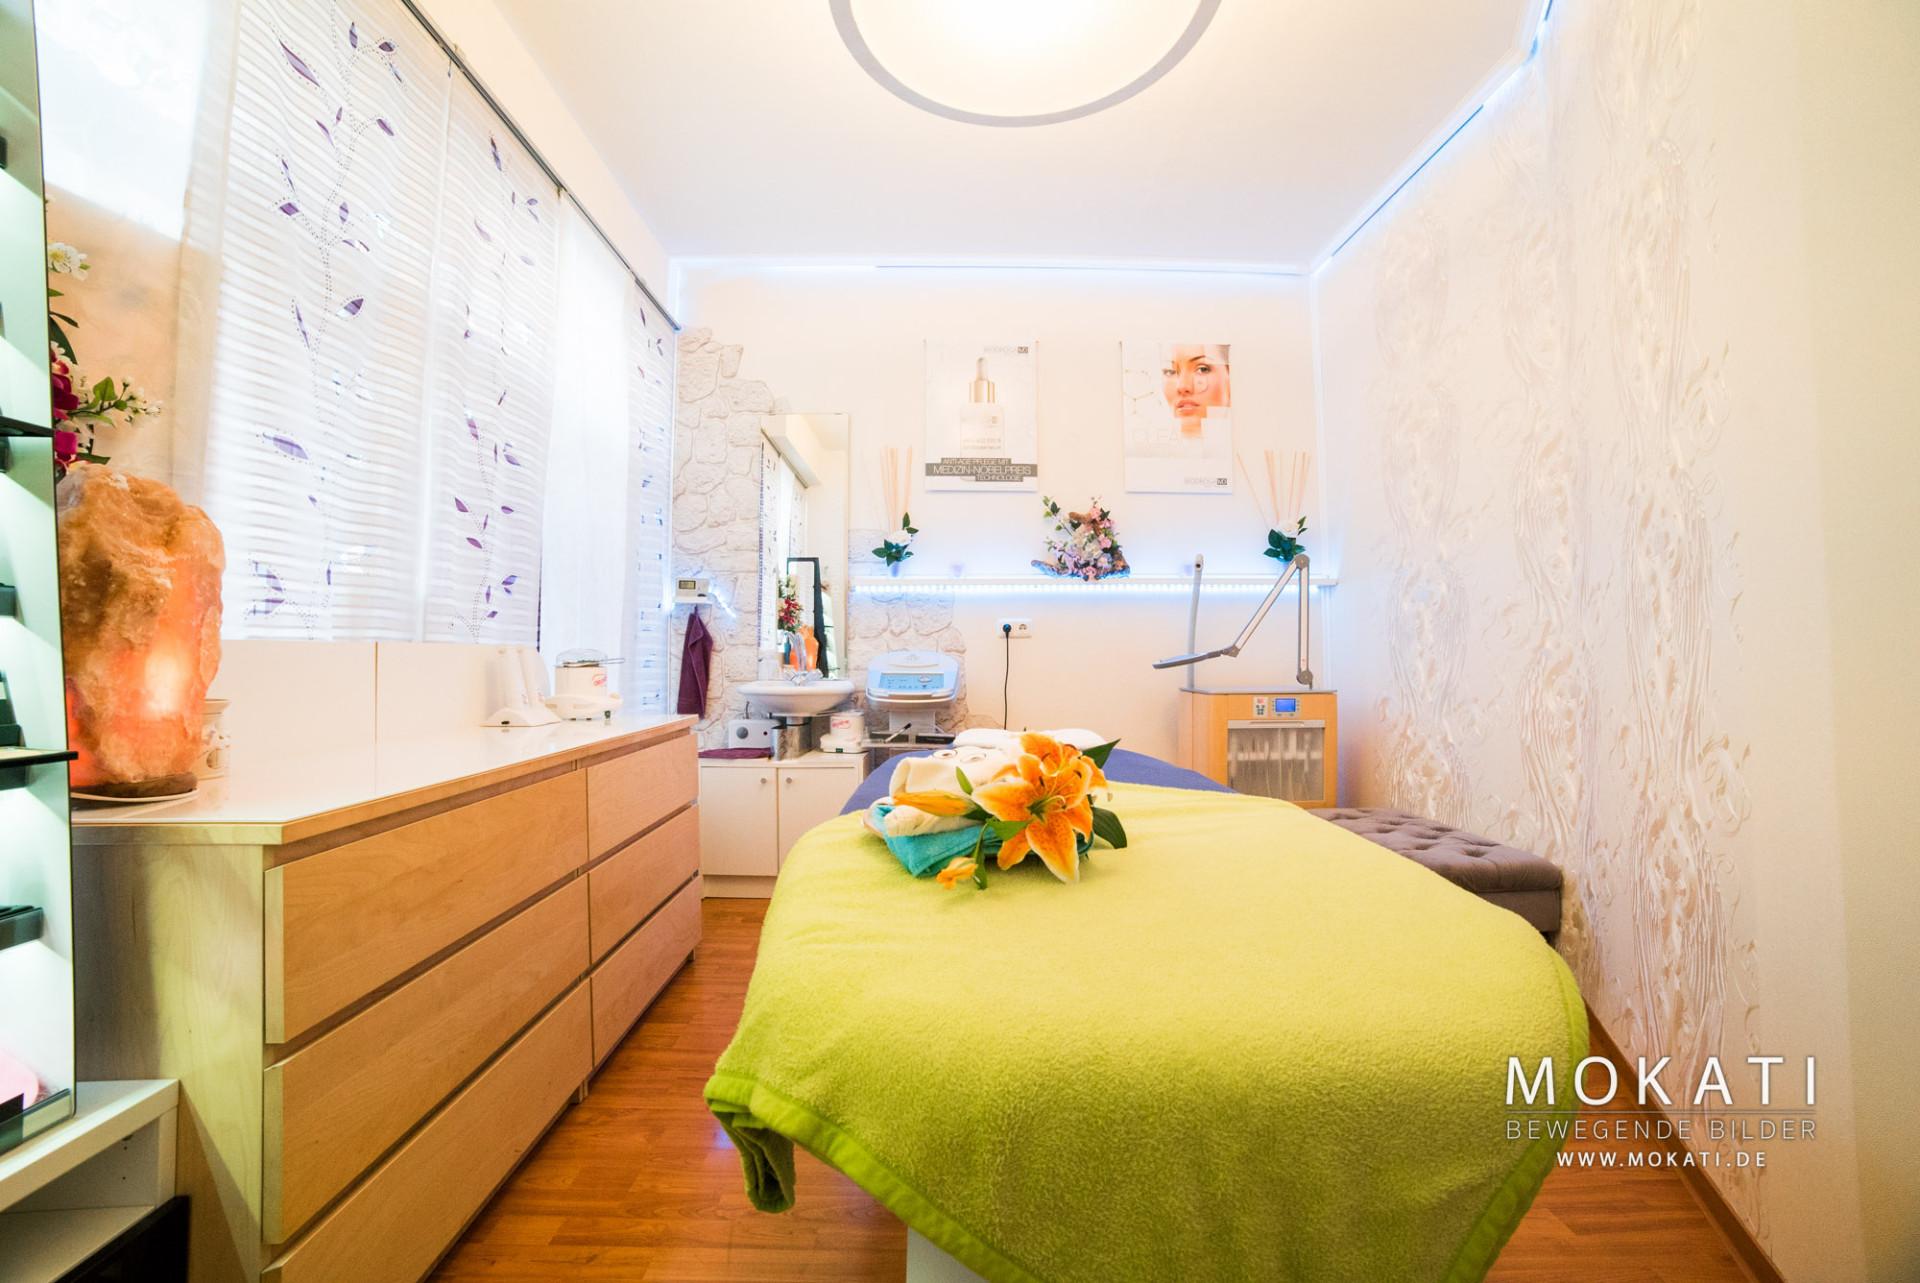 Redröh Kosmetikstudio und Beautystudio in München